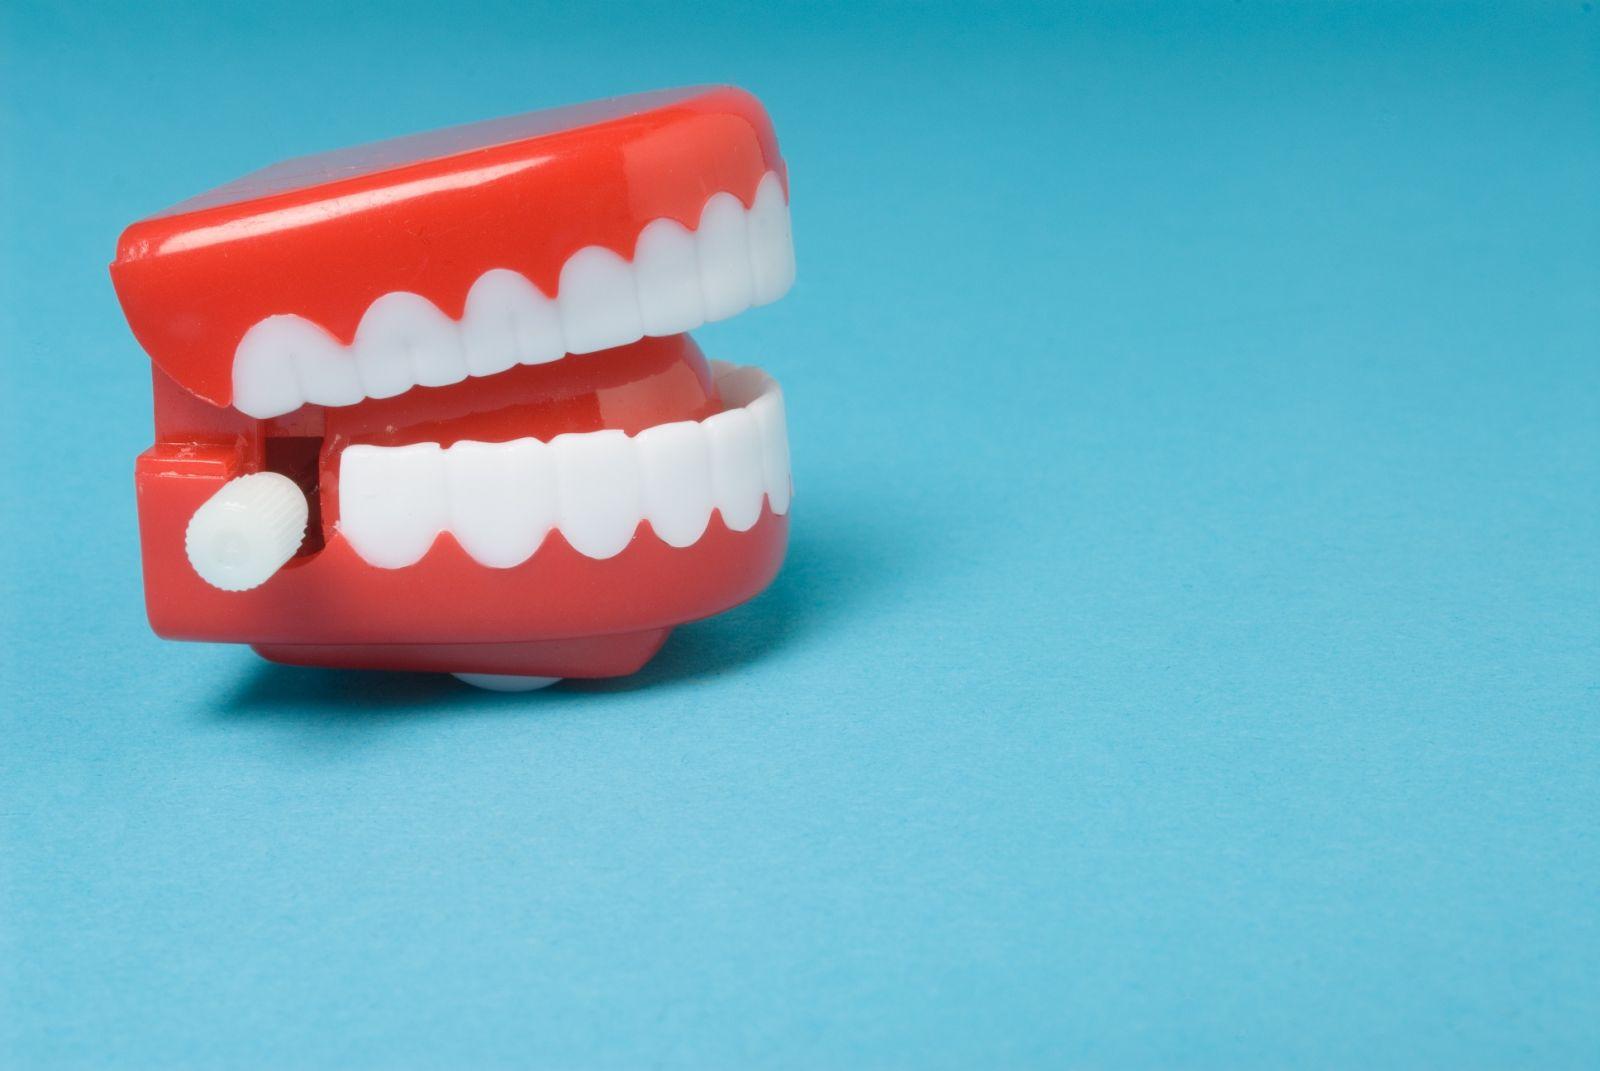 Prosthodontics International Specialist Clinic Isc